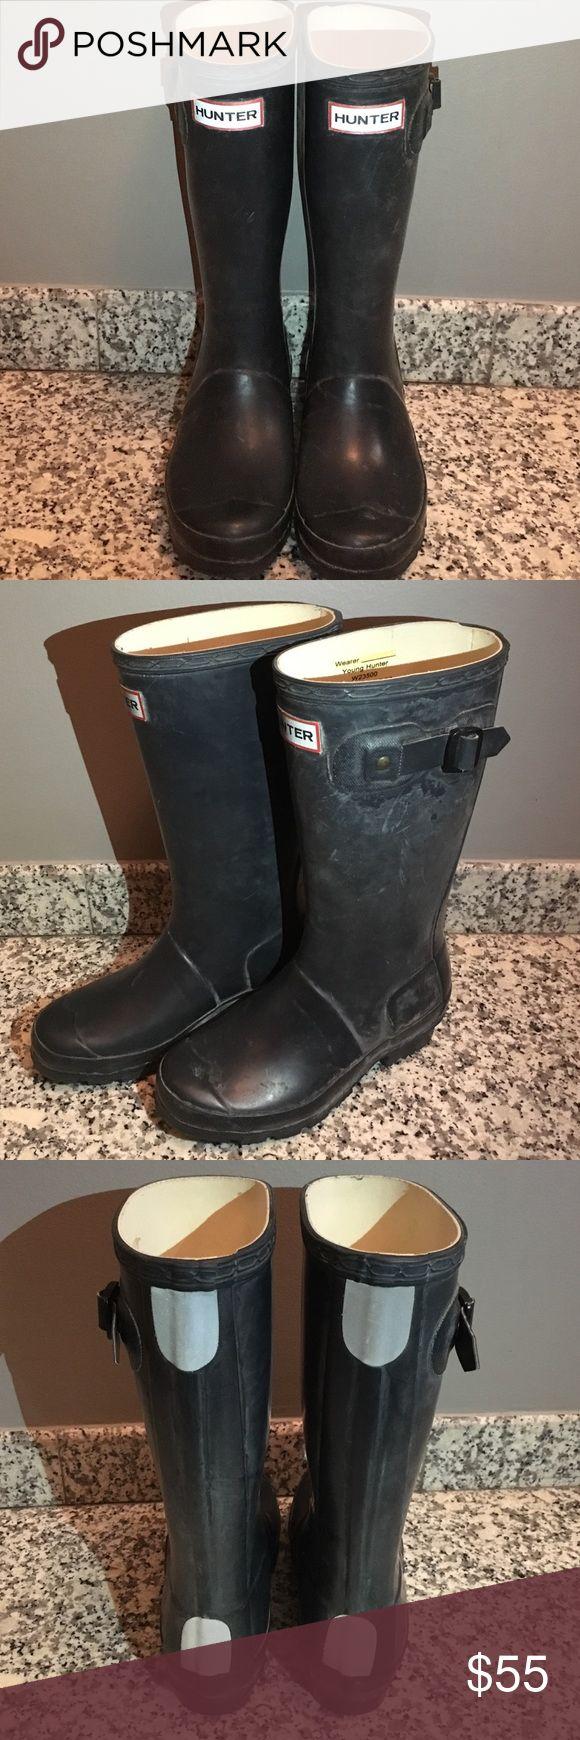 ☔️💦 KIDS HUNTER RAIN BOOTS 💦☔️ ☔️💦 Kids HUNTER Rain Boots 💦☔️ Size 2. Matte Navy. Reflectors on Back. Only wore a few times. Like New. Unisex Hunter Boots Shoes Rain & Snow Boots